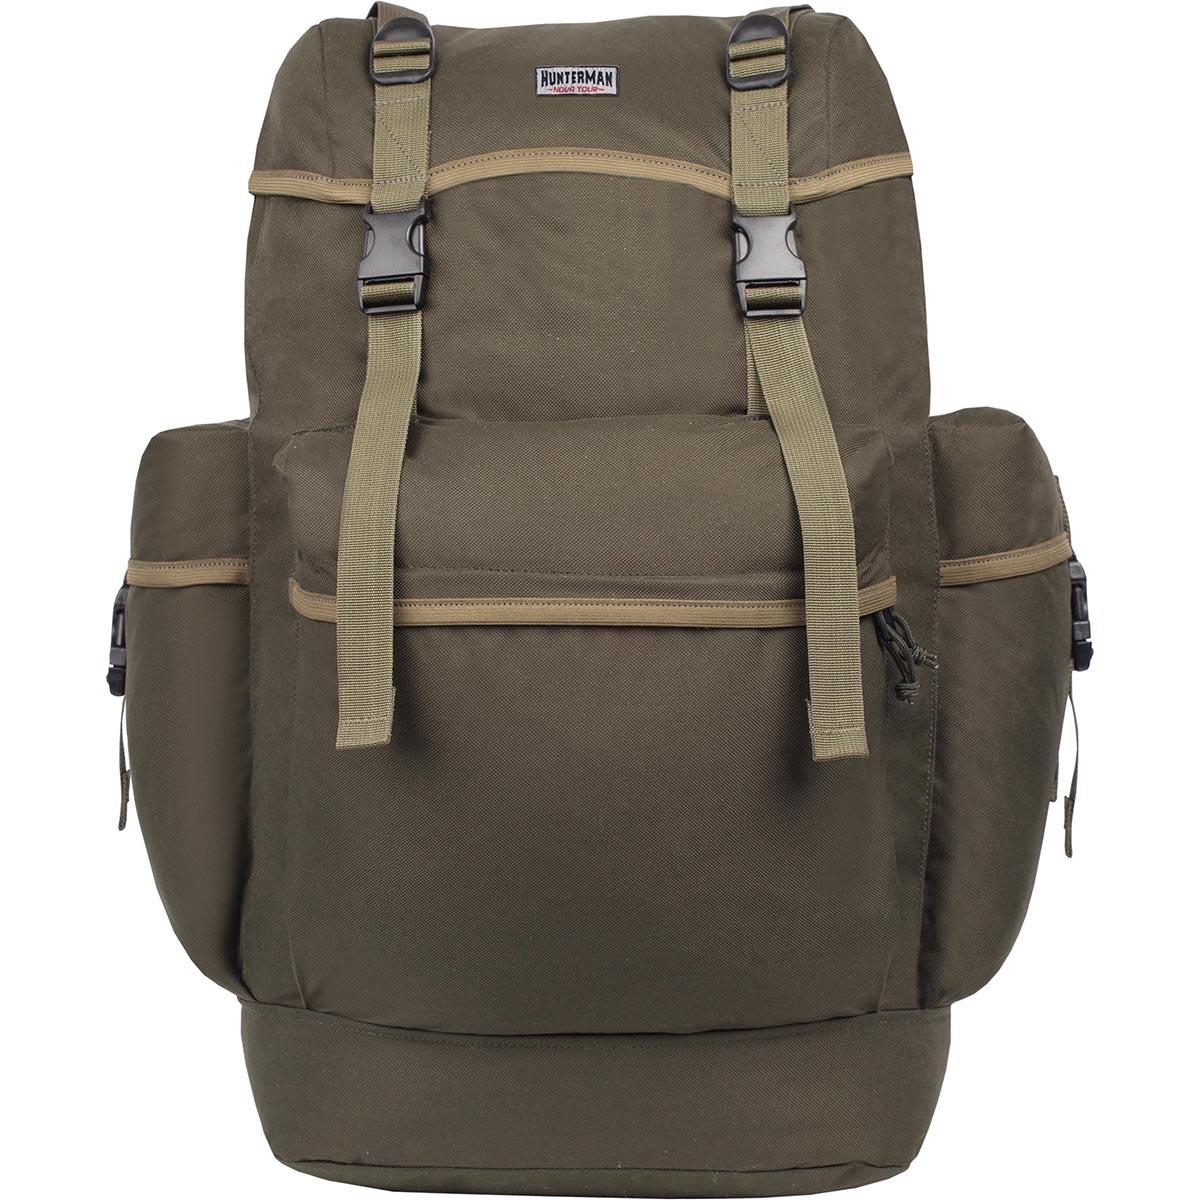 Рюкзак для охоты Hunter Nova Tour  Охотник 35 V3 , цвет: зеленый, 35 л - Охота